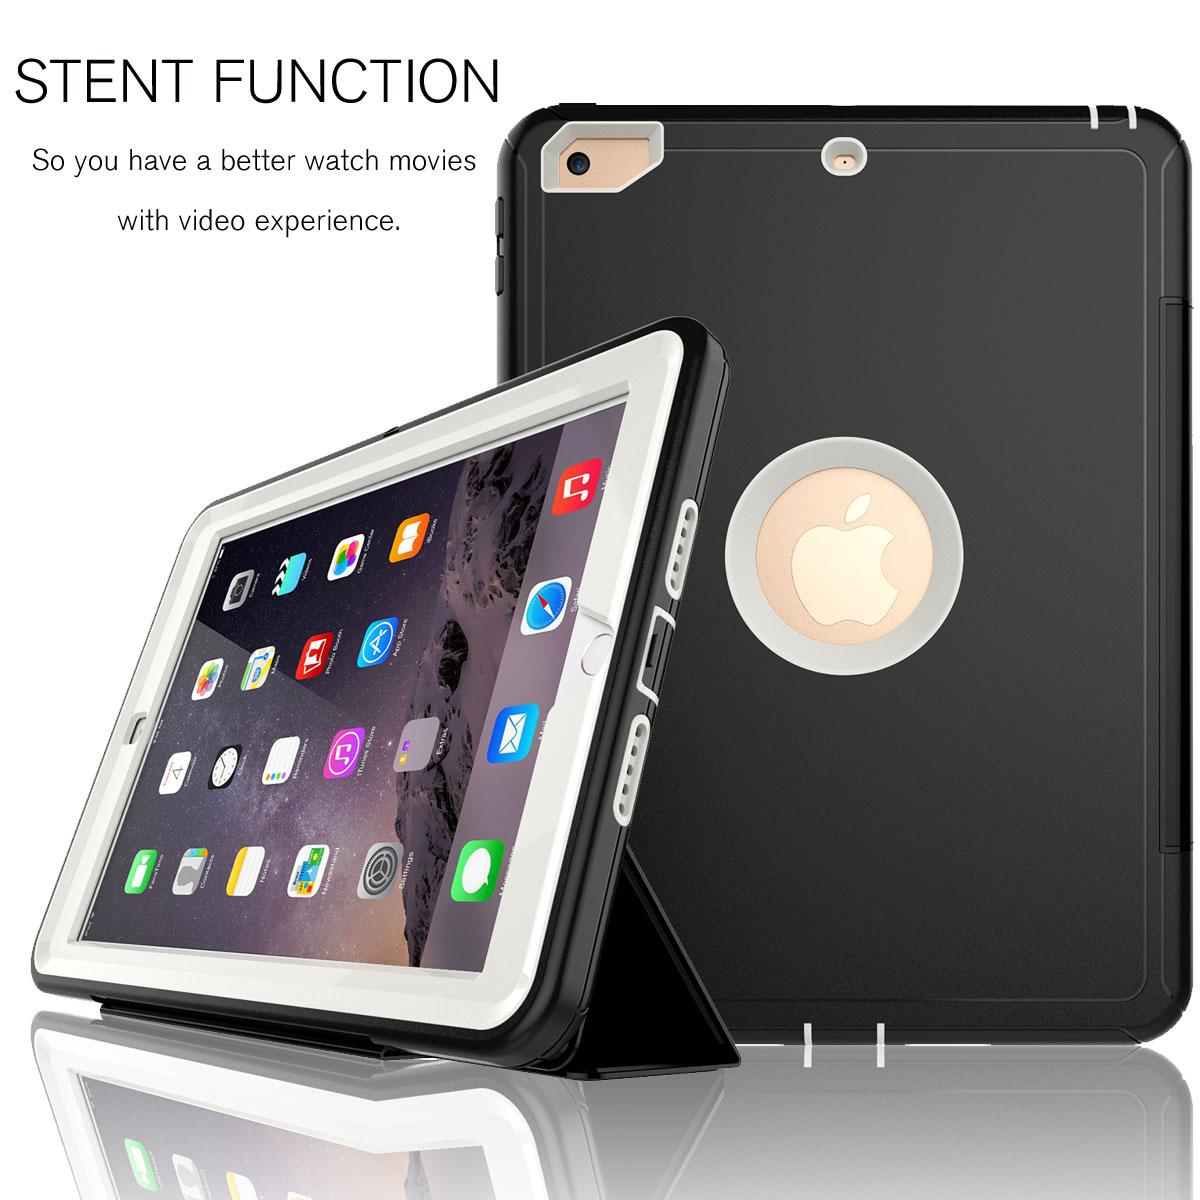 for ipad 9 7 2018 2017 6th gen shockproof full protective. Black Bedroom Furniture Sets. Home Design Ideas